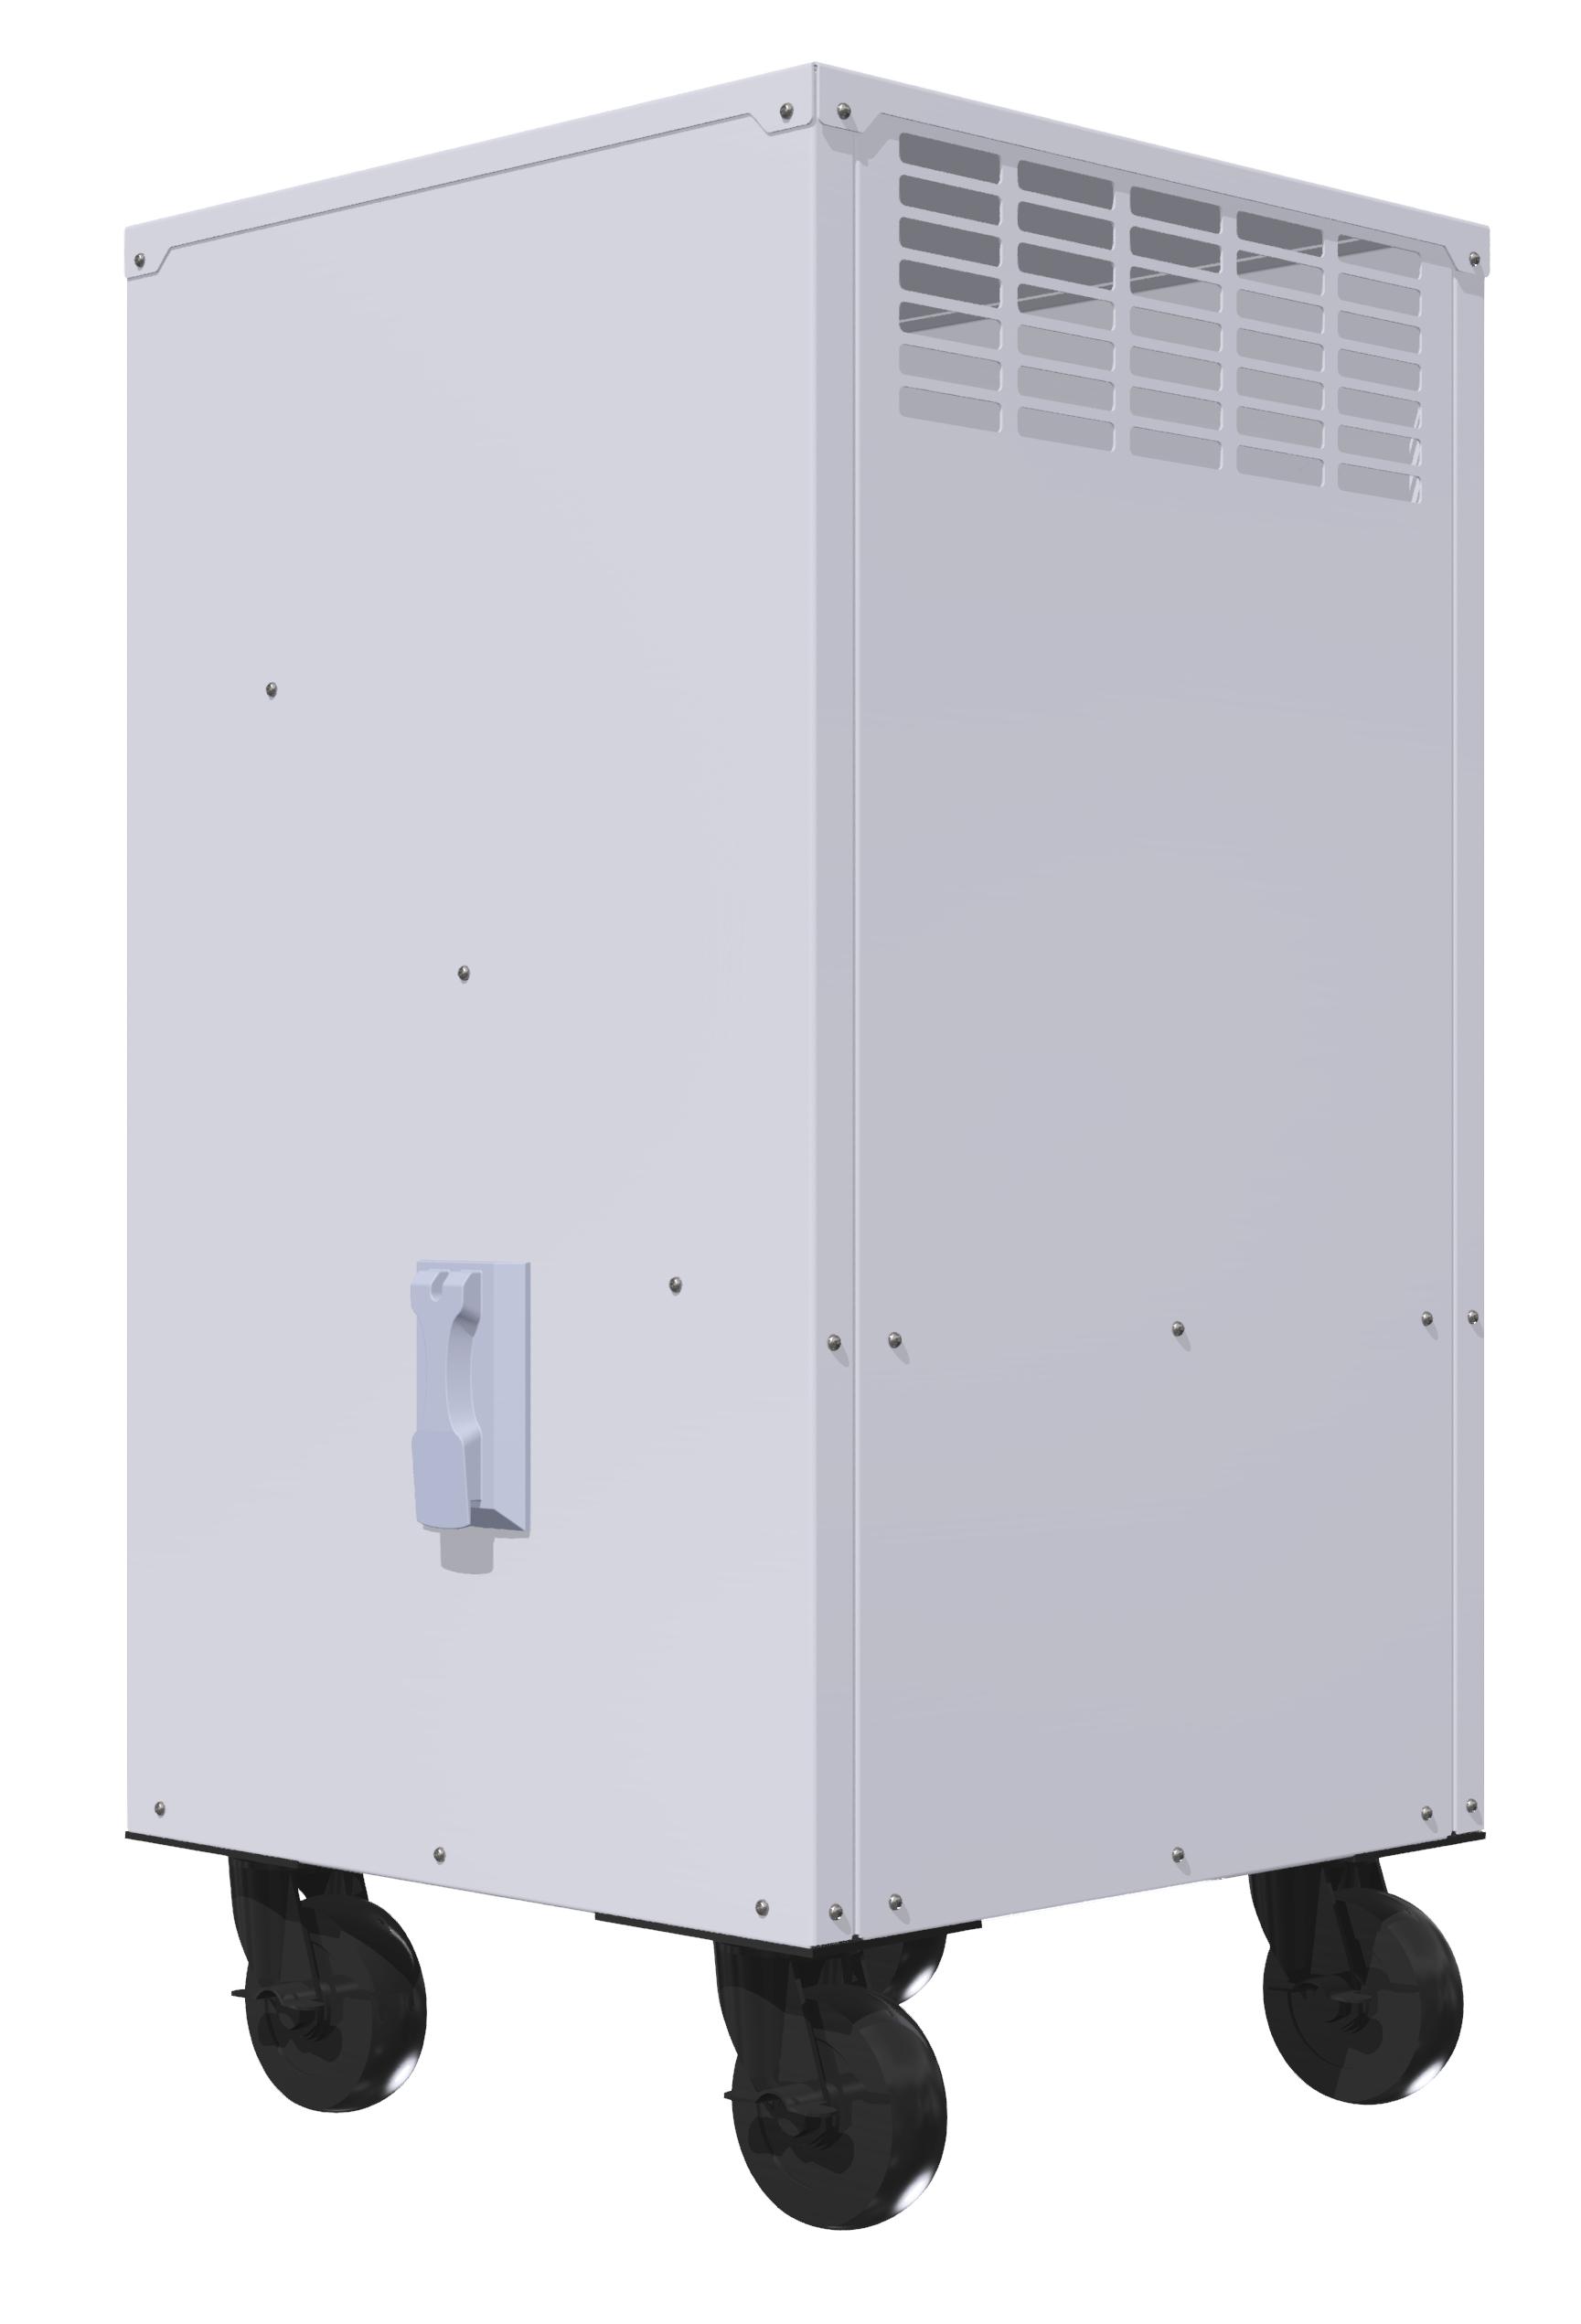 Portable Air Purifier 500 - Portable air purifier 500 2